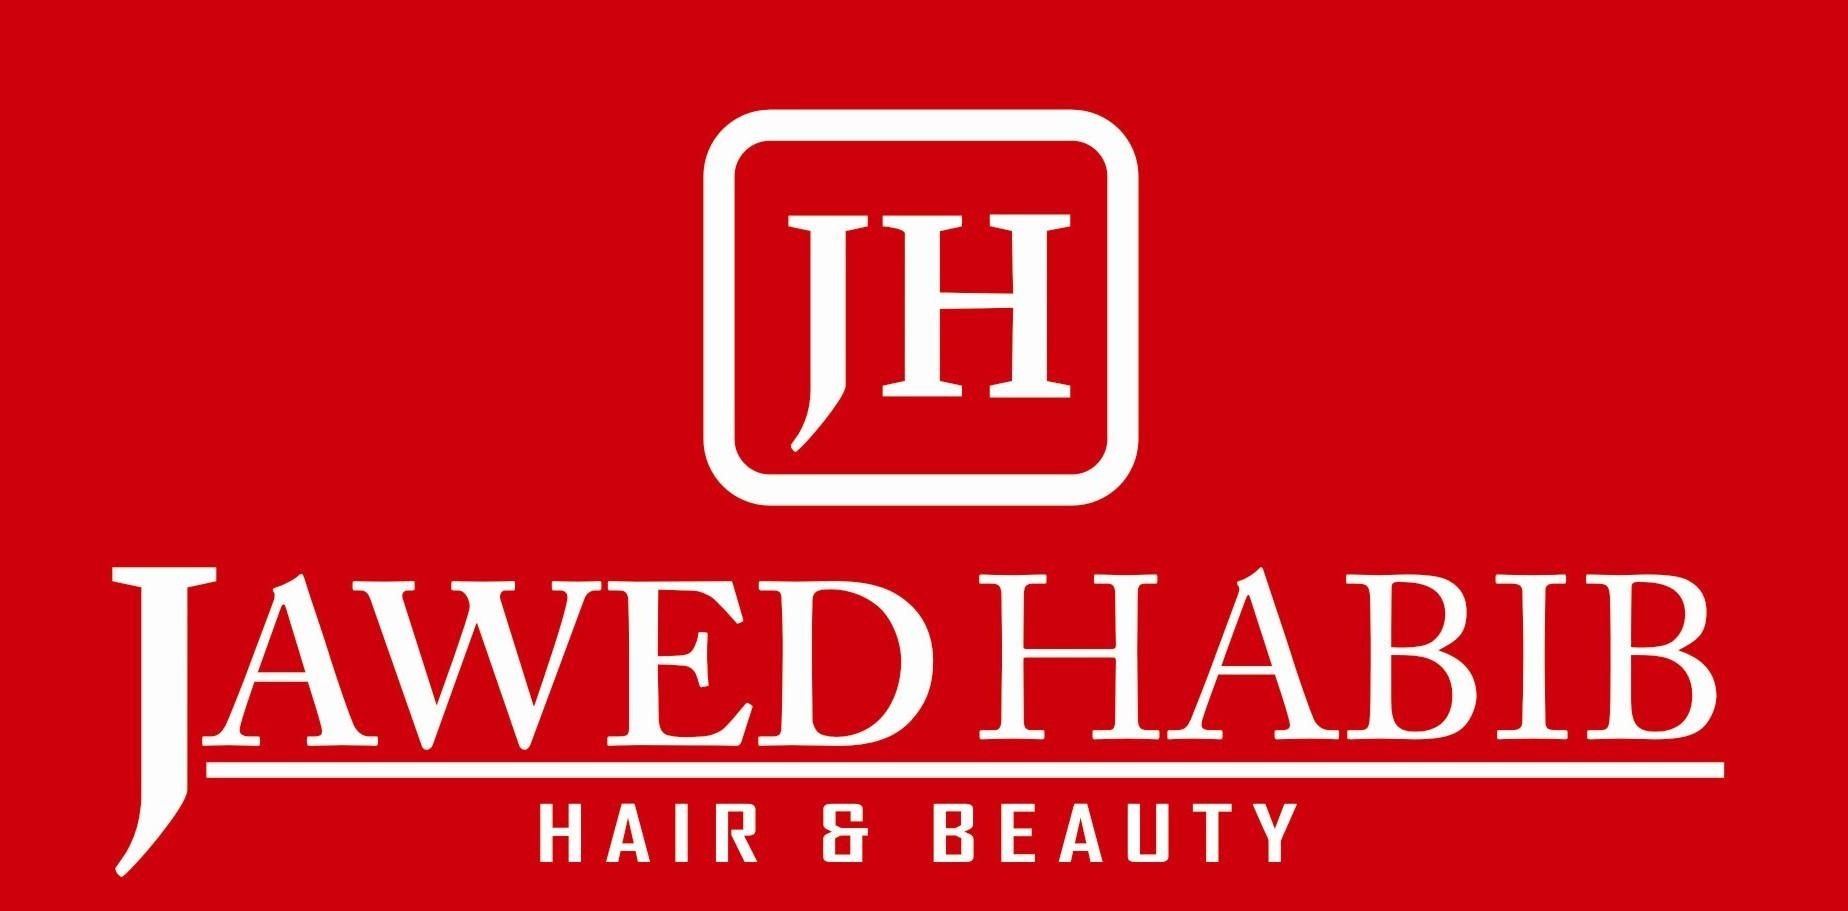 Jawed Habib Hair & Beauty Salons - Main Market - Firozabad Image